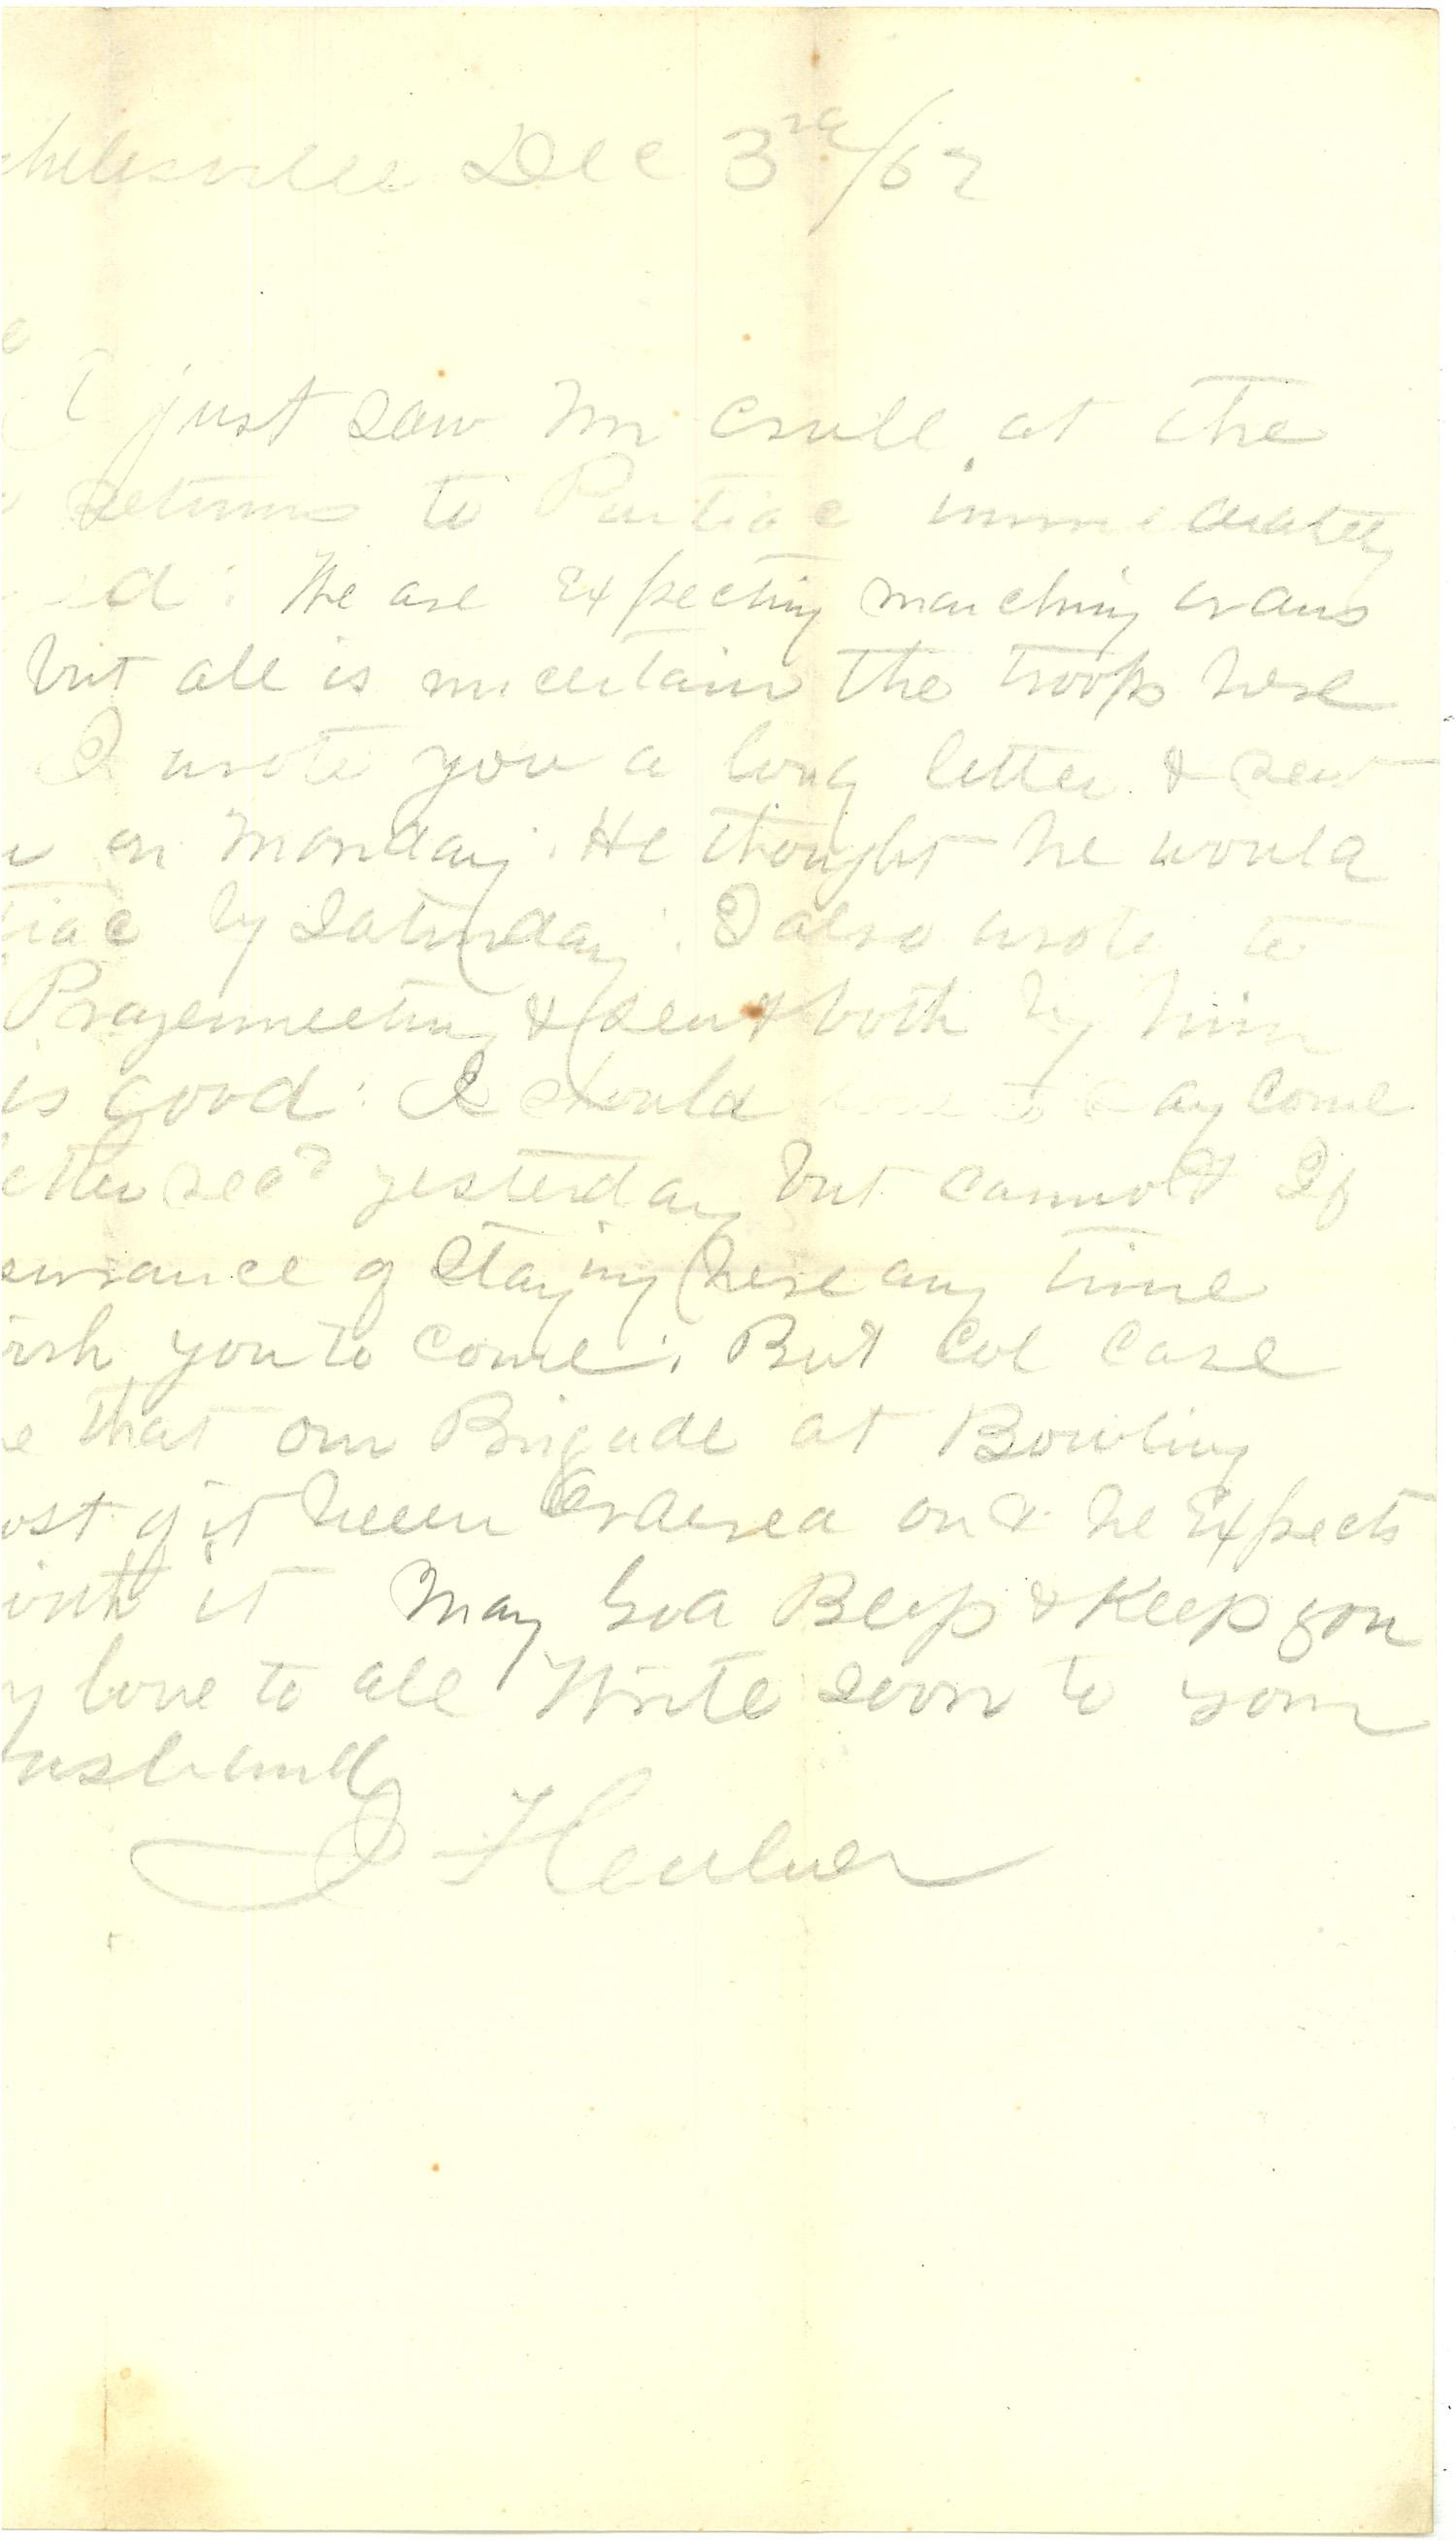 Joseph Culver Letter, December 3, 1862, Letter 2, Page 1